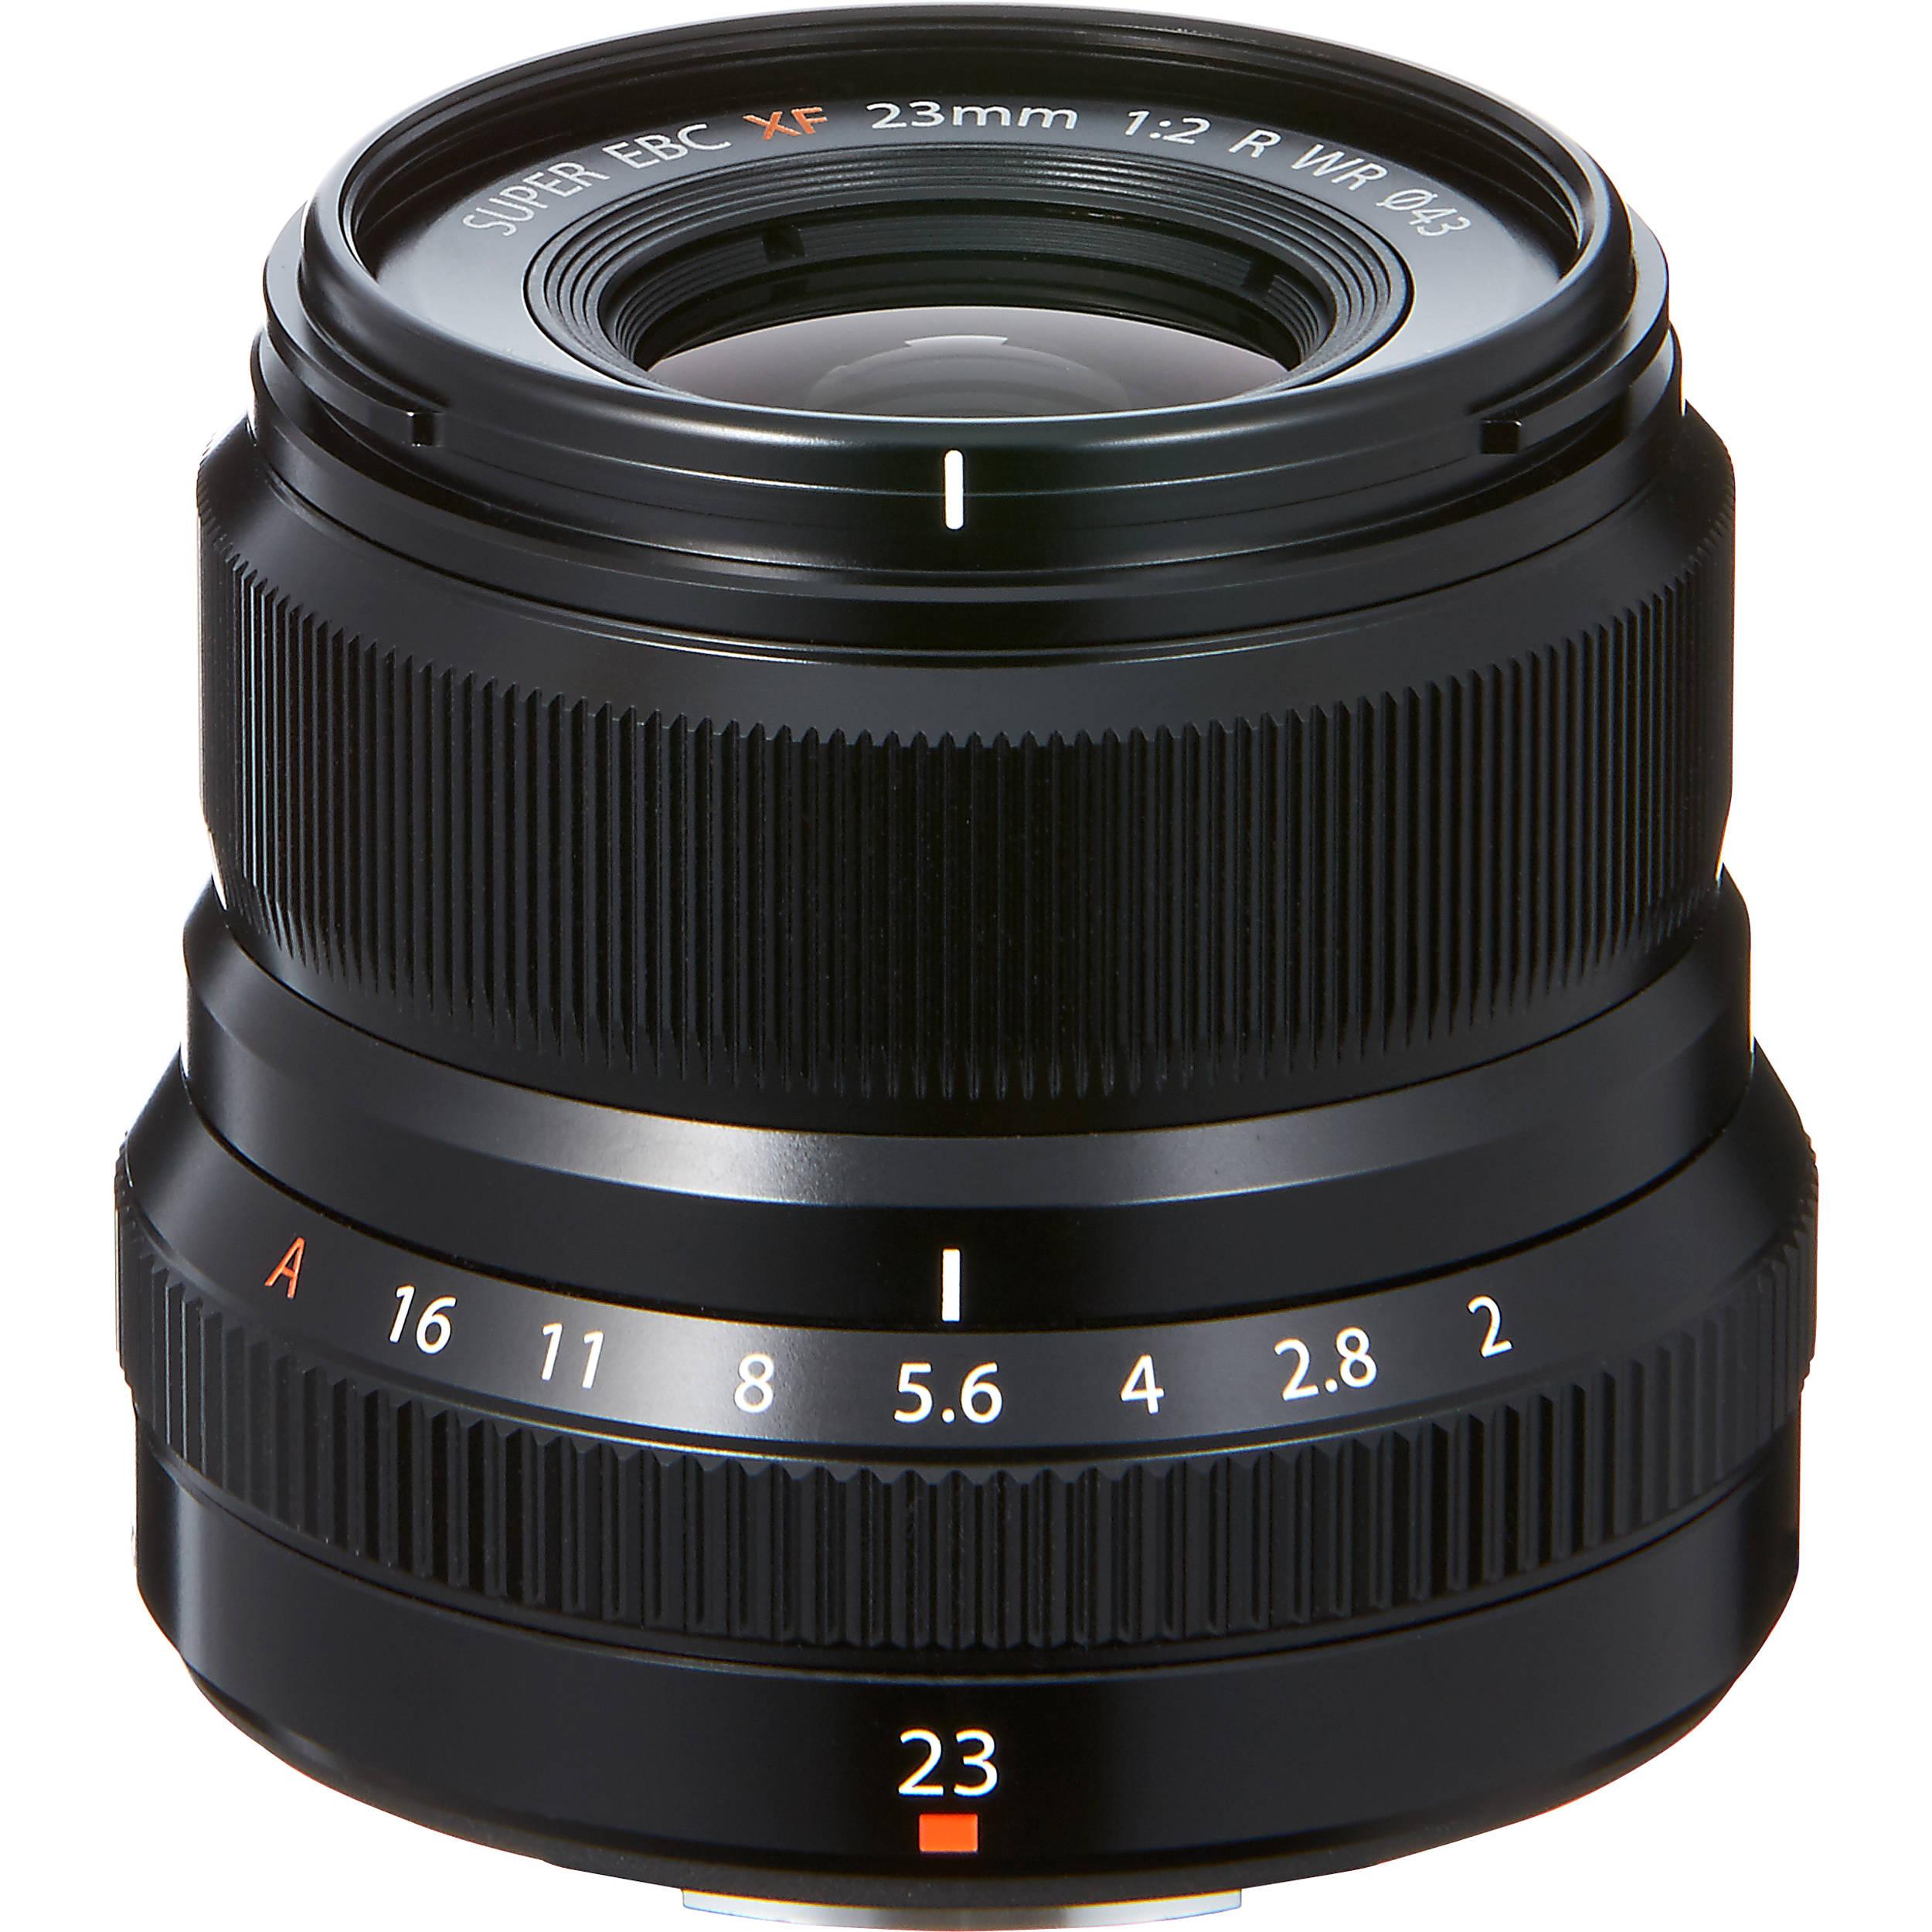 Fujifilm Fujinon XF23mm F2 R WR